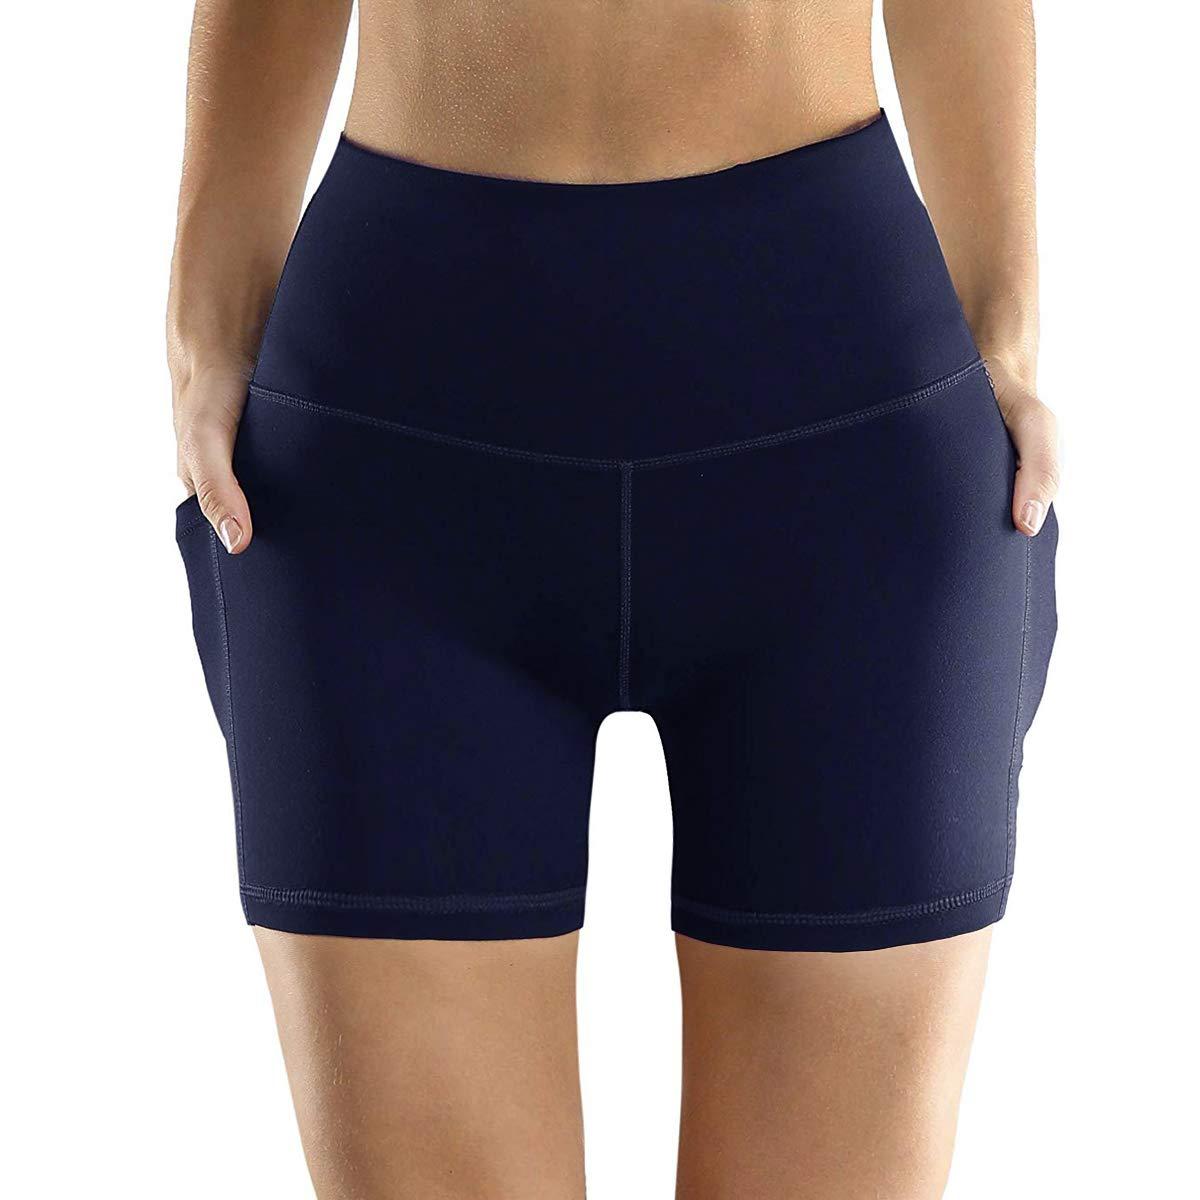 DILANNI Women's Short Yoga Side Pockets High Waist Bike Workout Running Shorts(Navy Blue S)